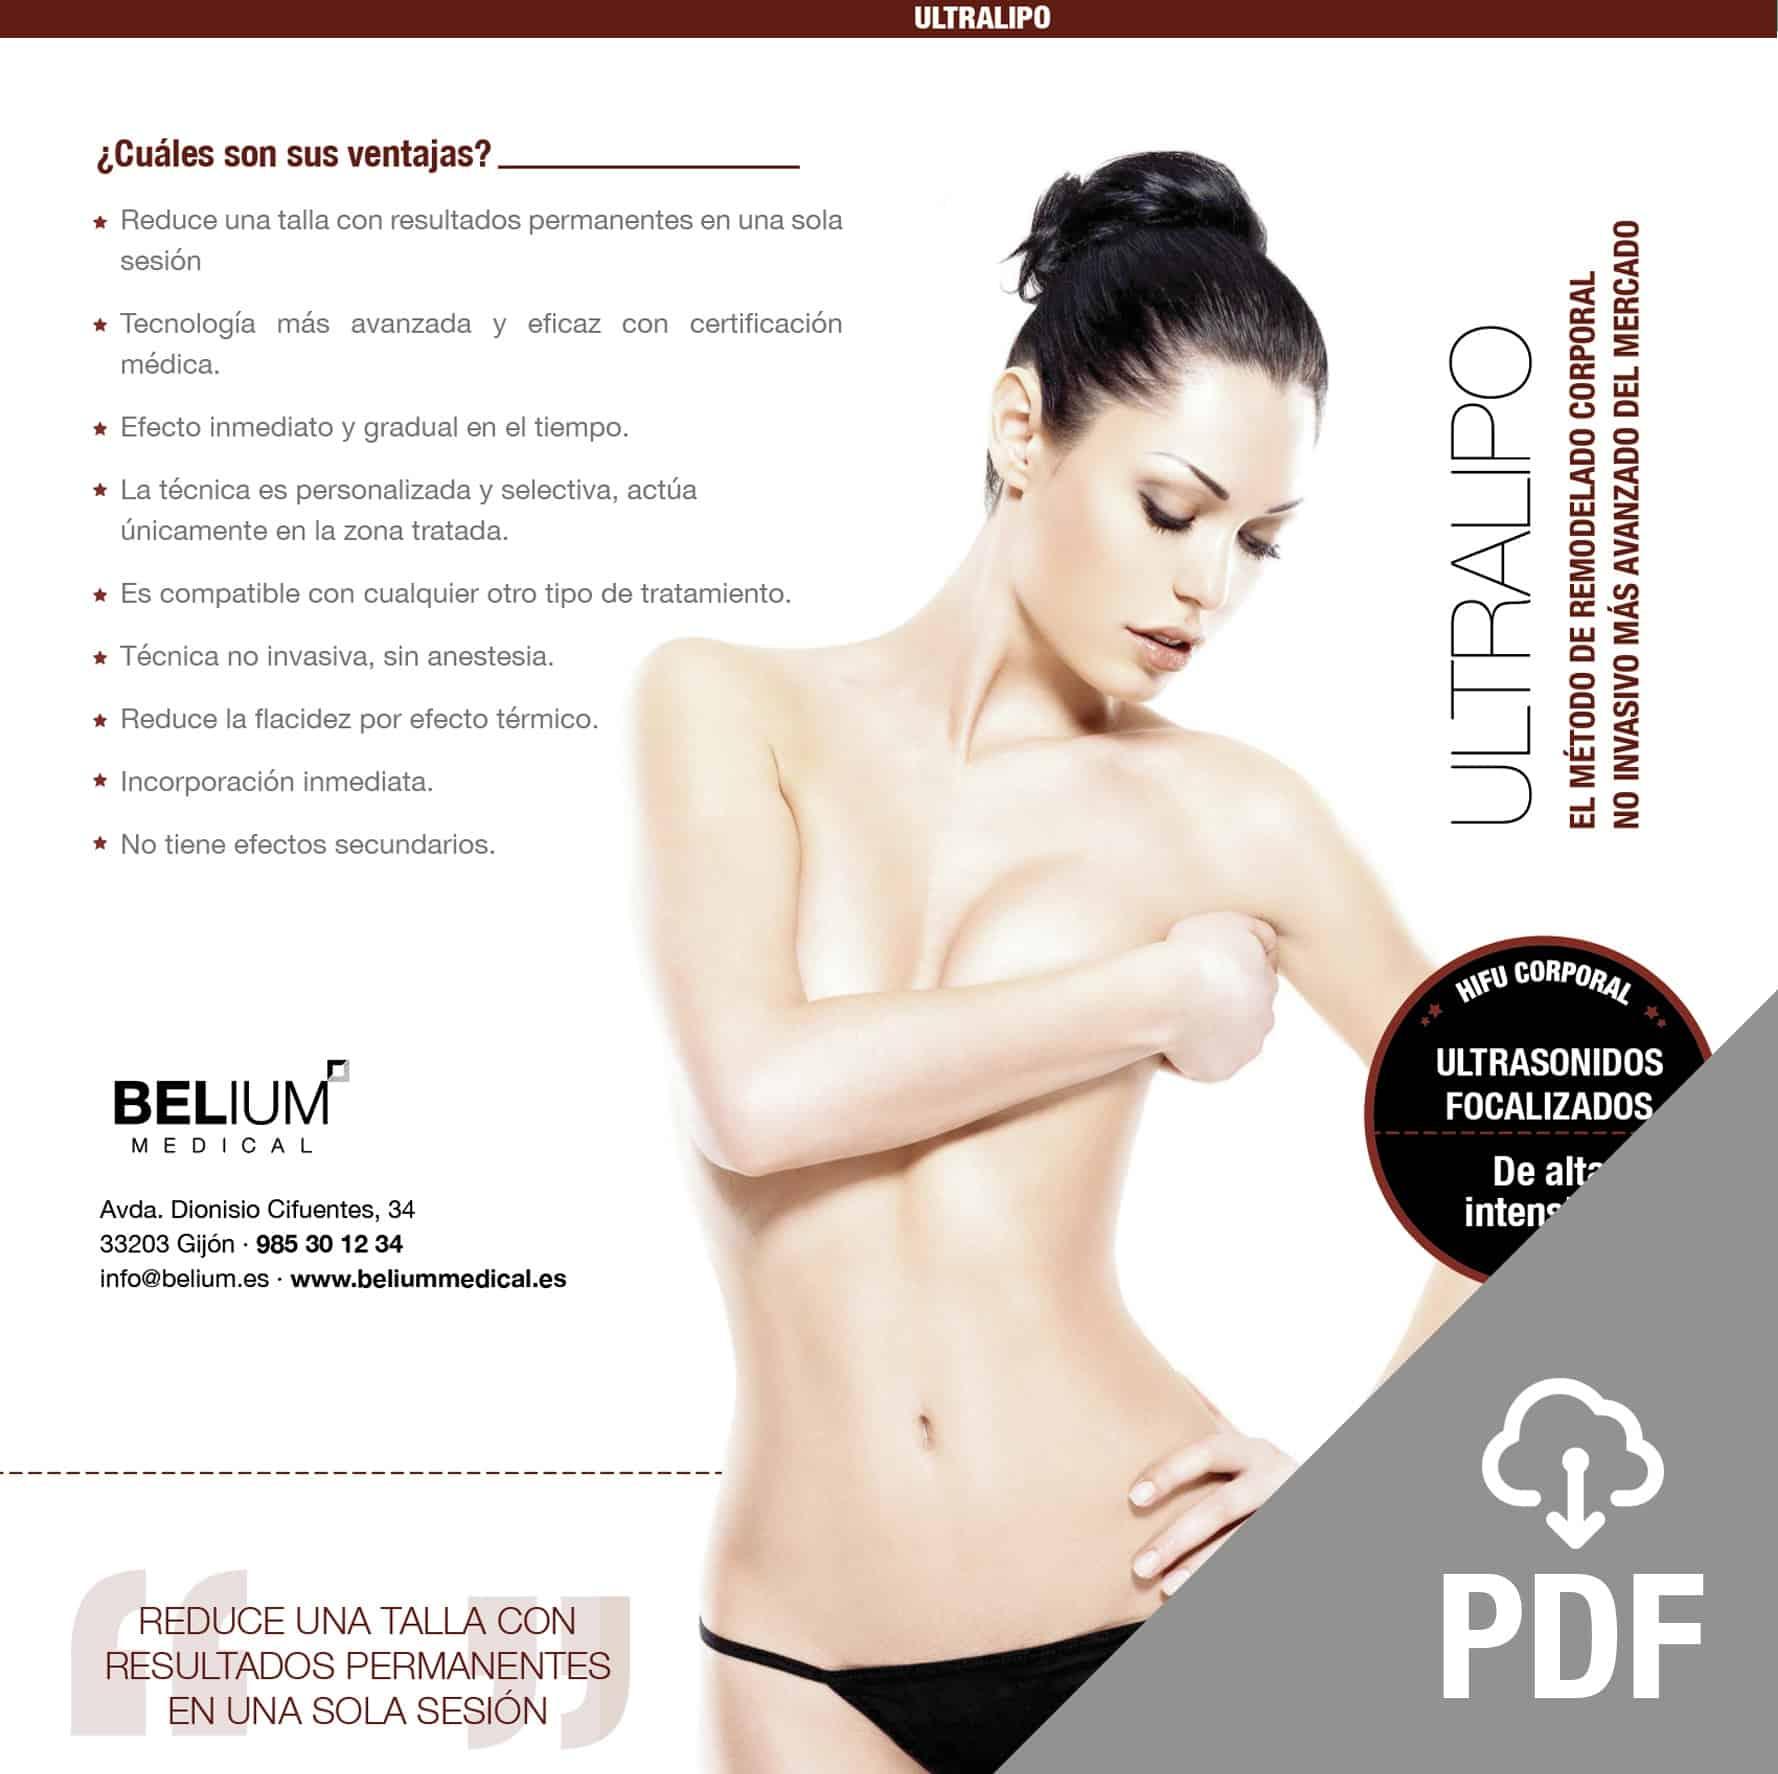 ultralipo pdf remodelado corporal HIFU descompone grasa subcutánea. Belium Medical distribuidor oficial españa